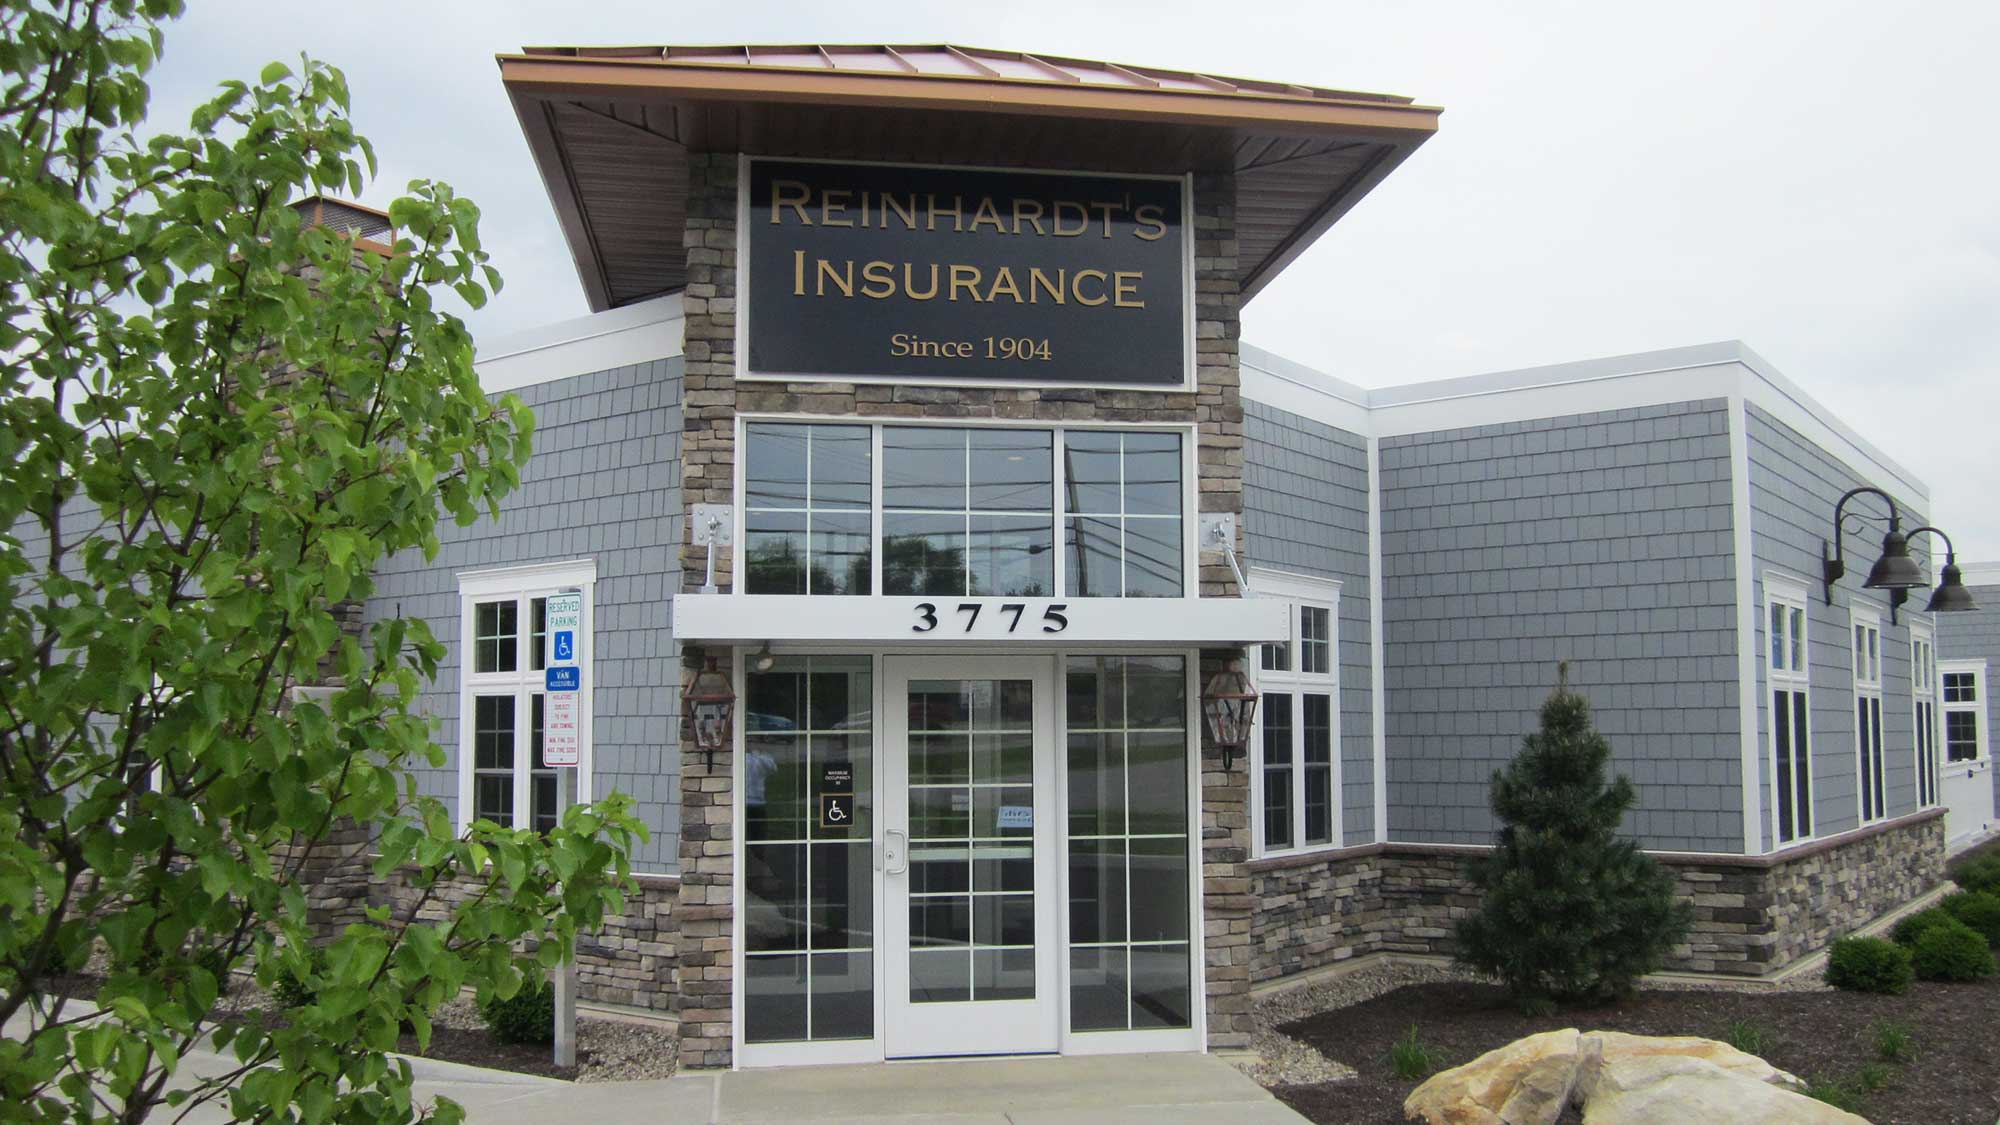 Reinhardt's Insurance remodel